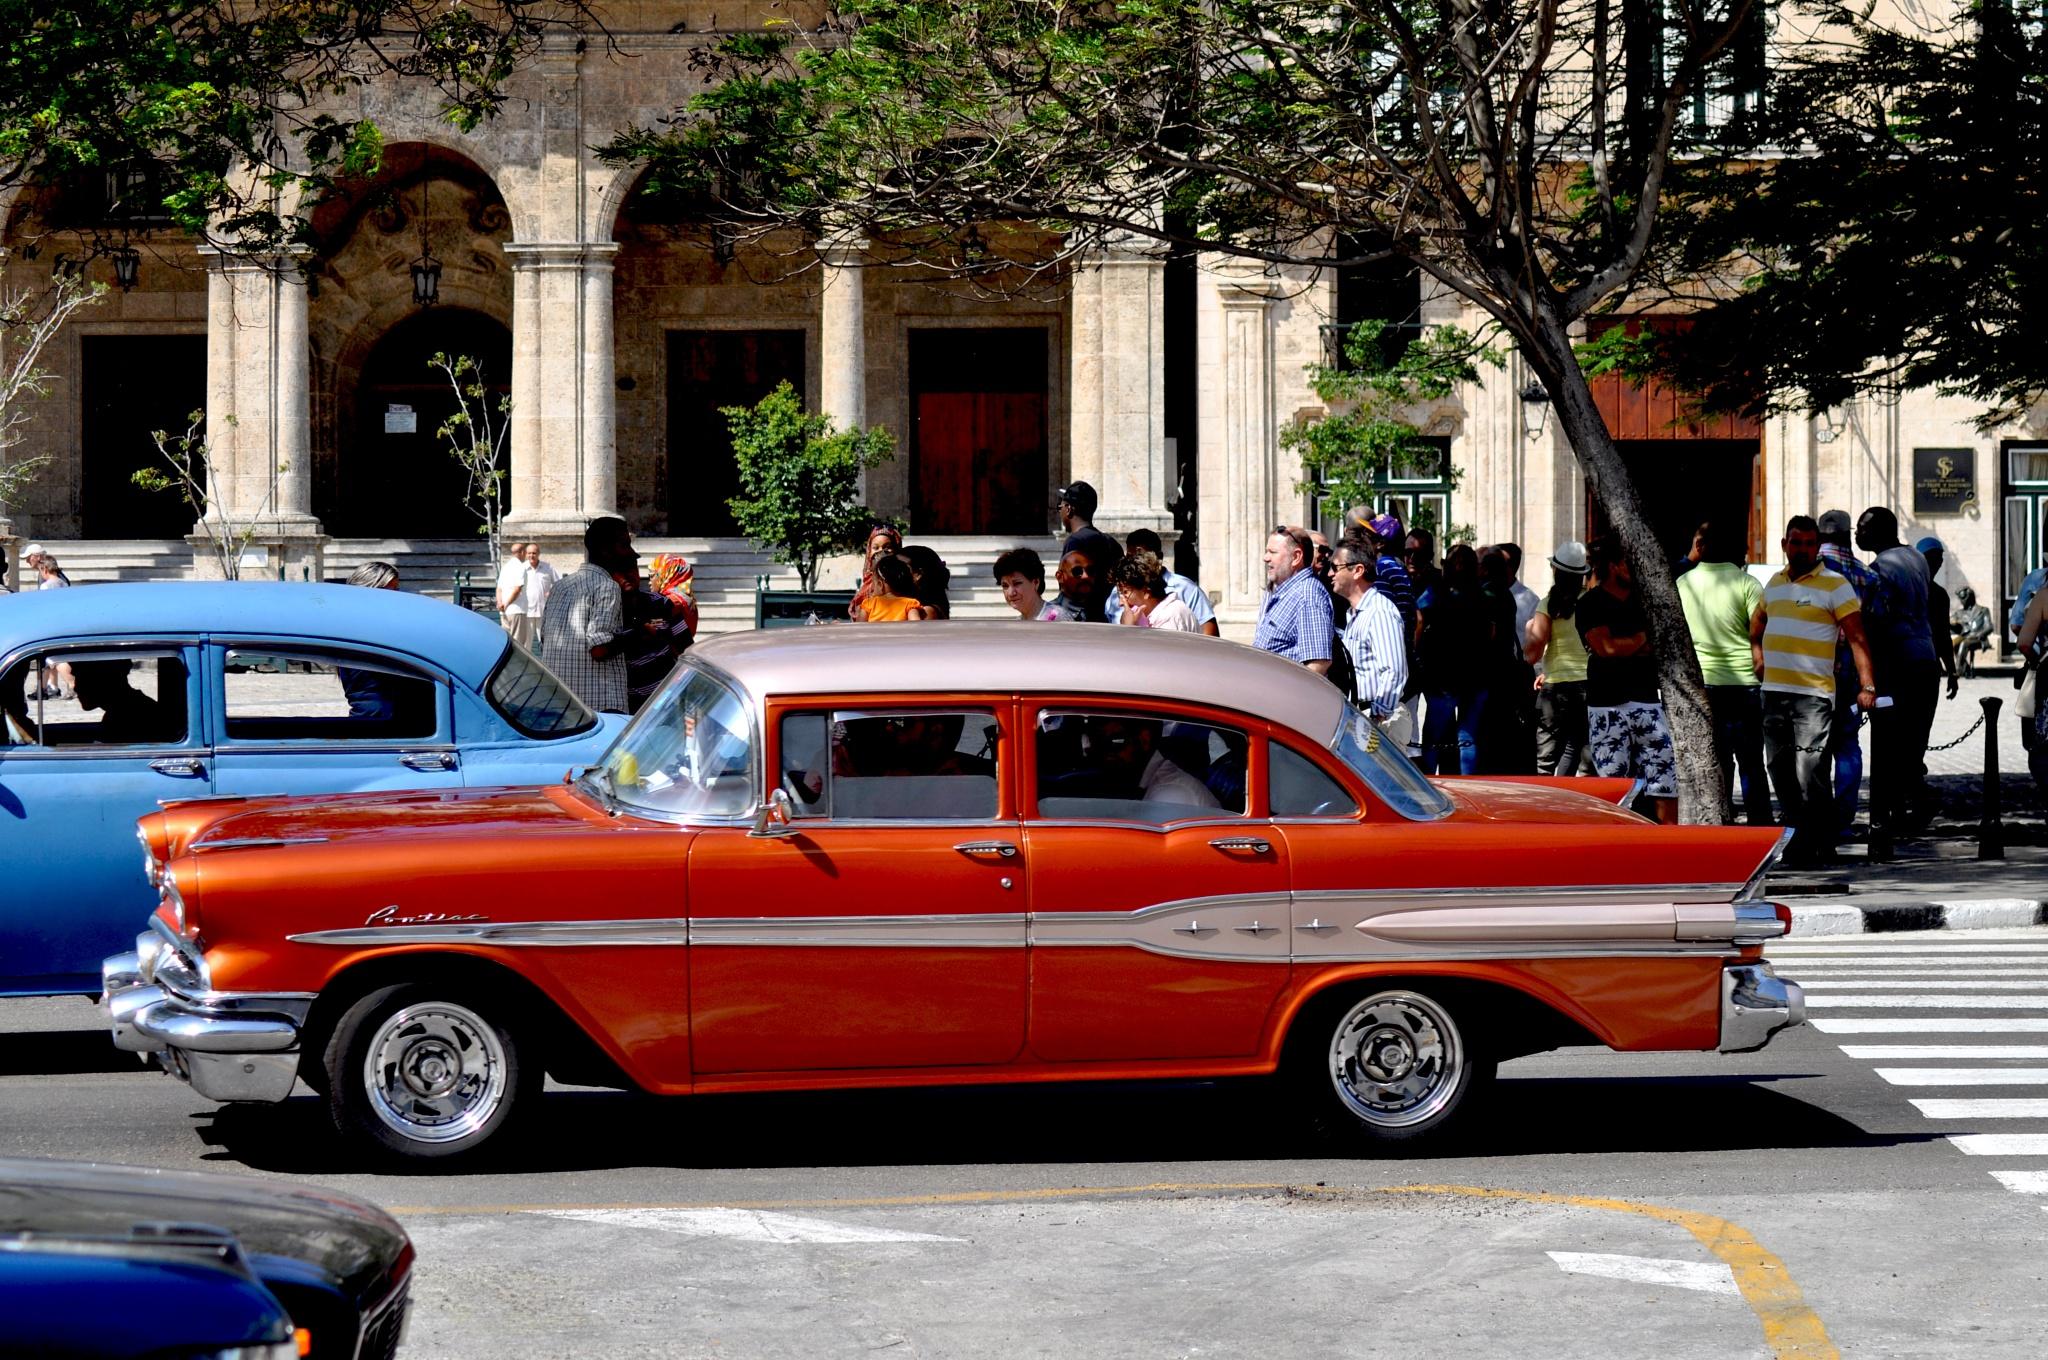 Old Pontiac in Havana, cuba by Francine Verronneau